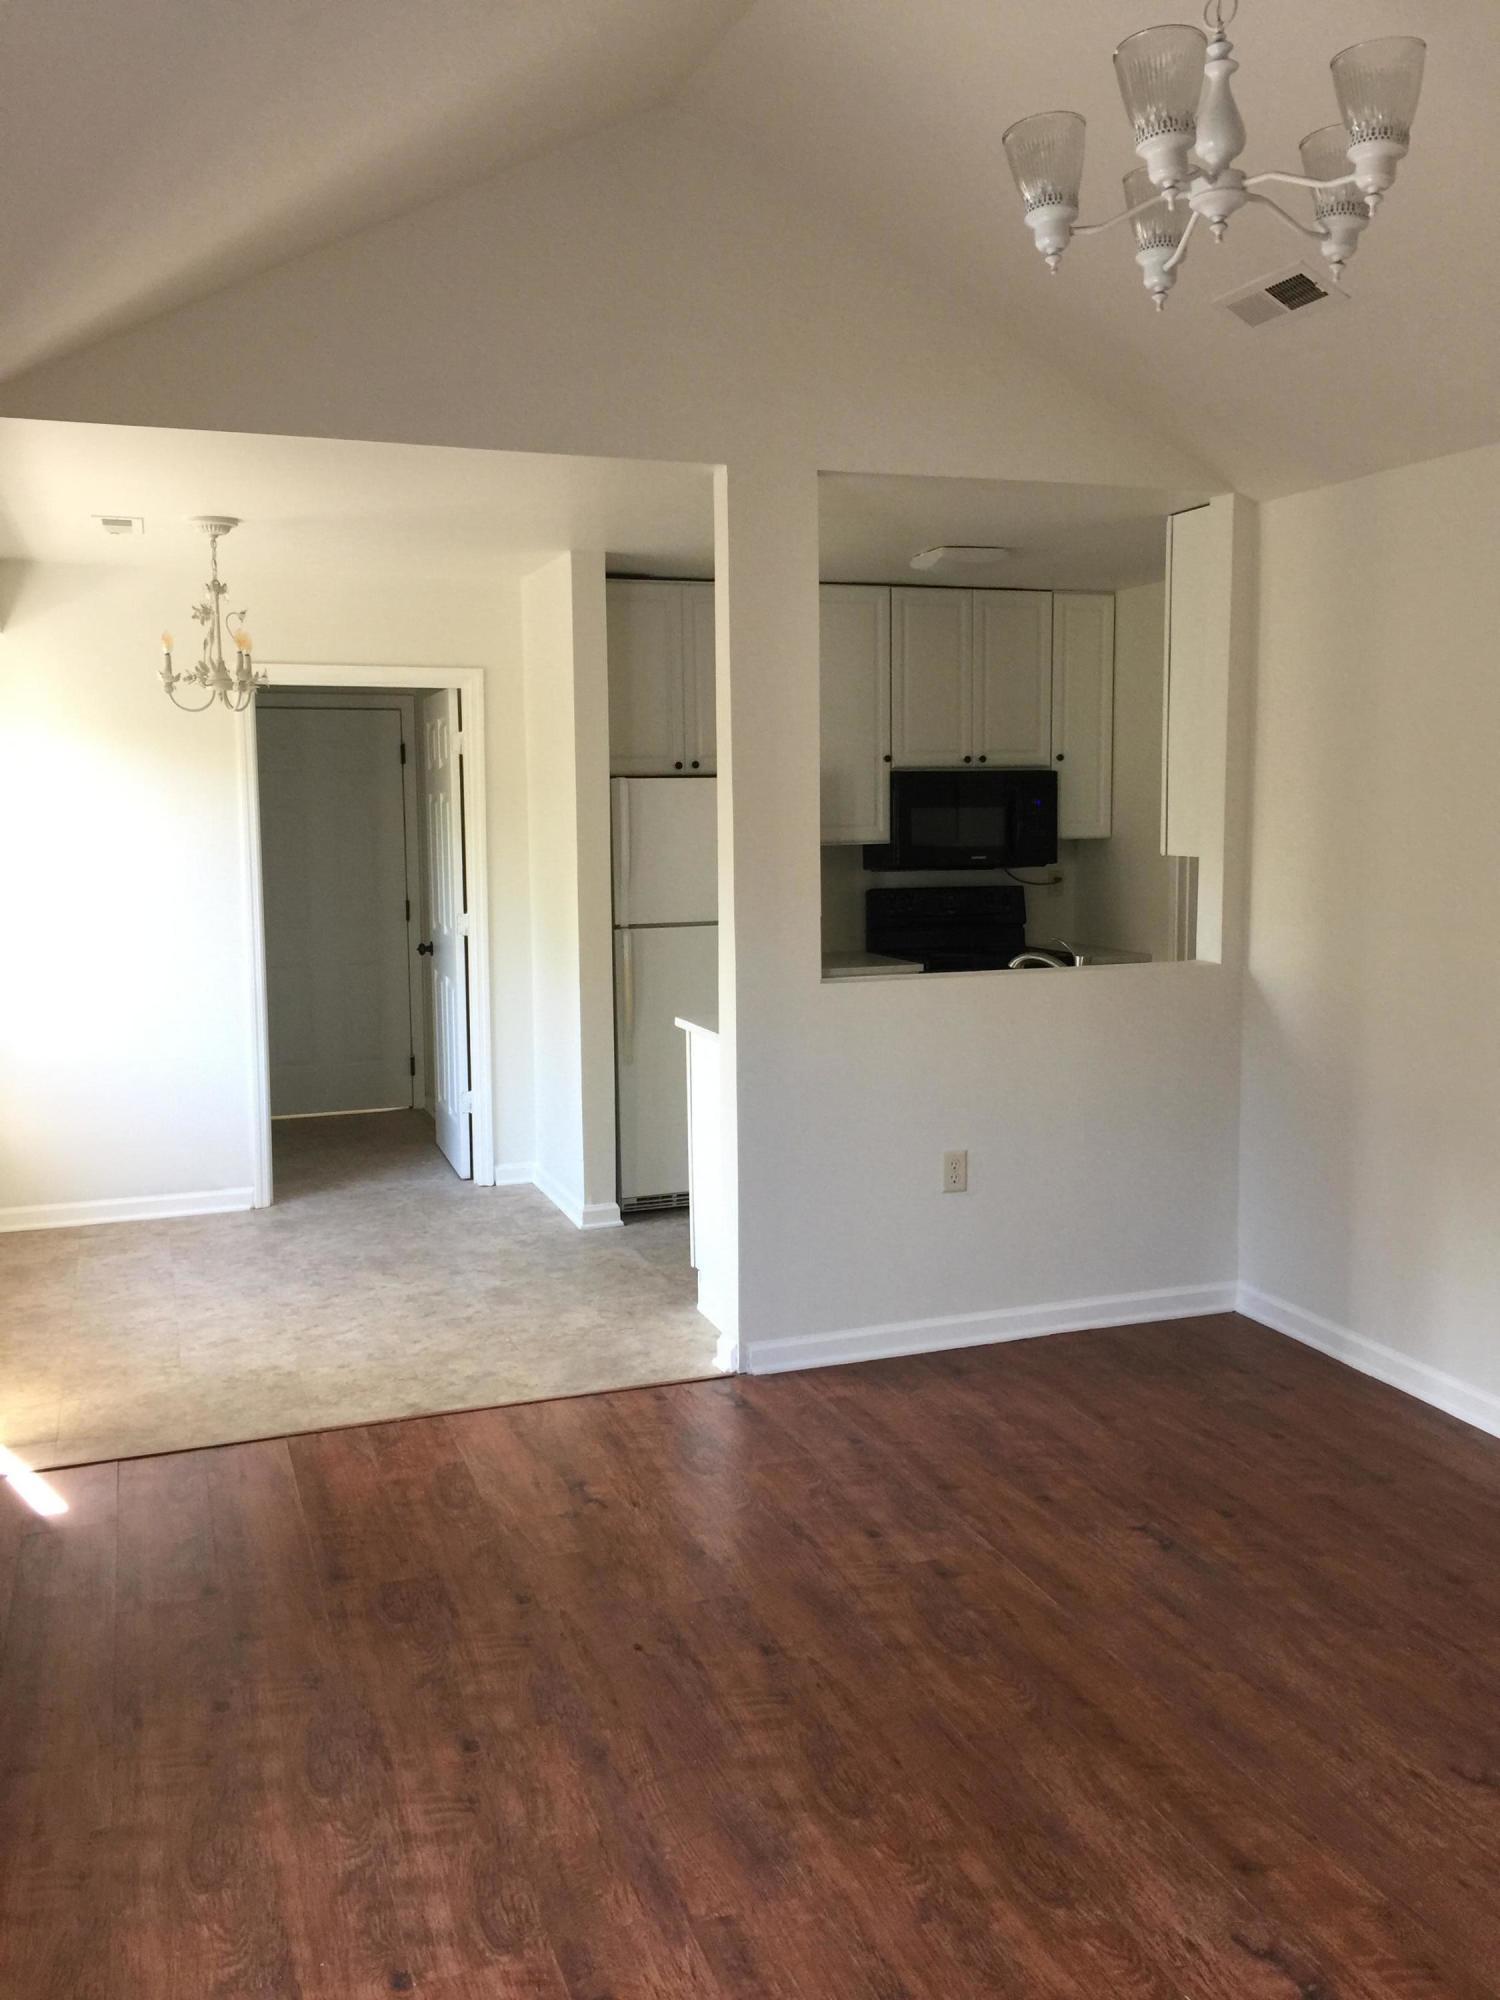 Quail Run Homes For Sale - 1202 Chicorie, Charleston, SC - 8